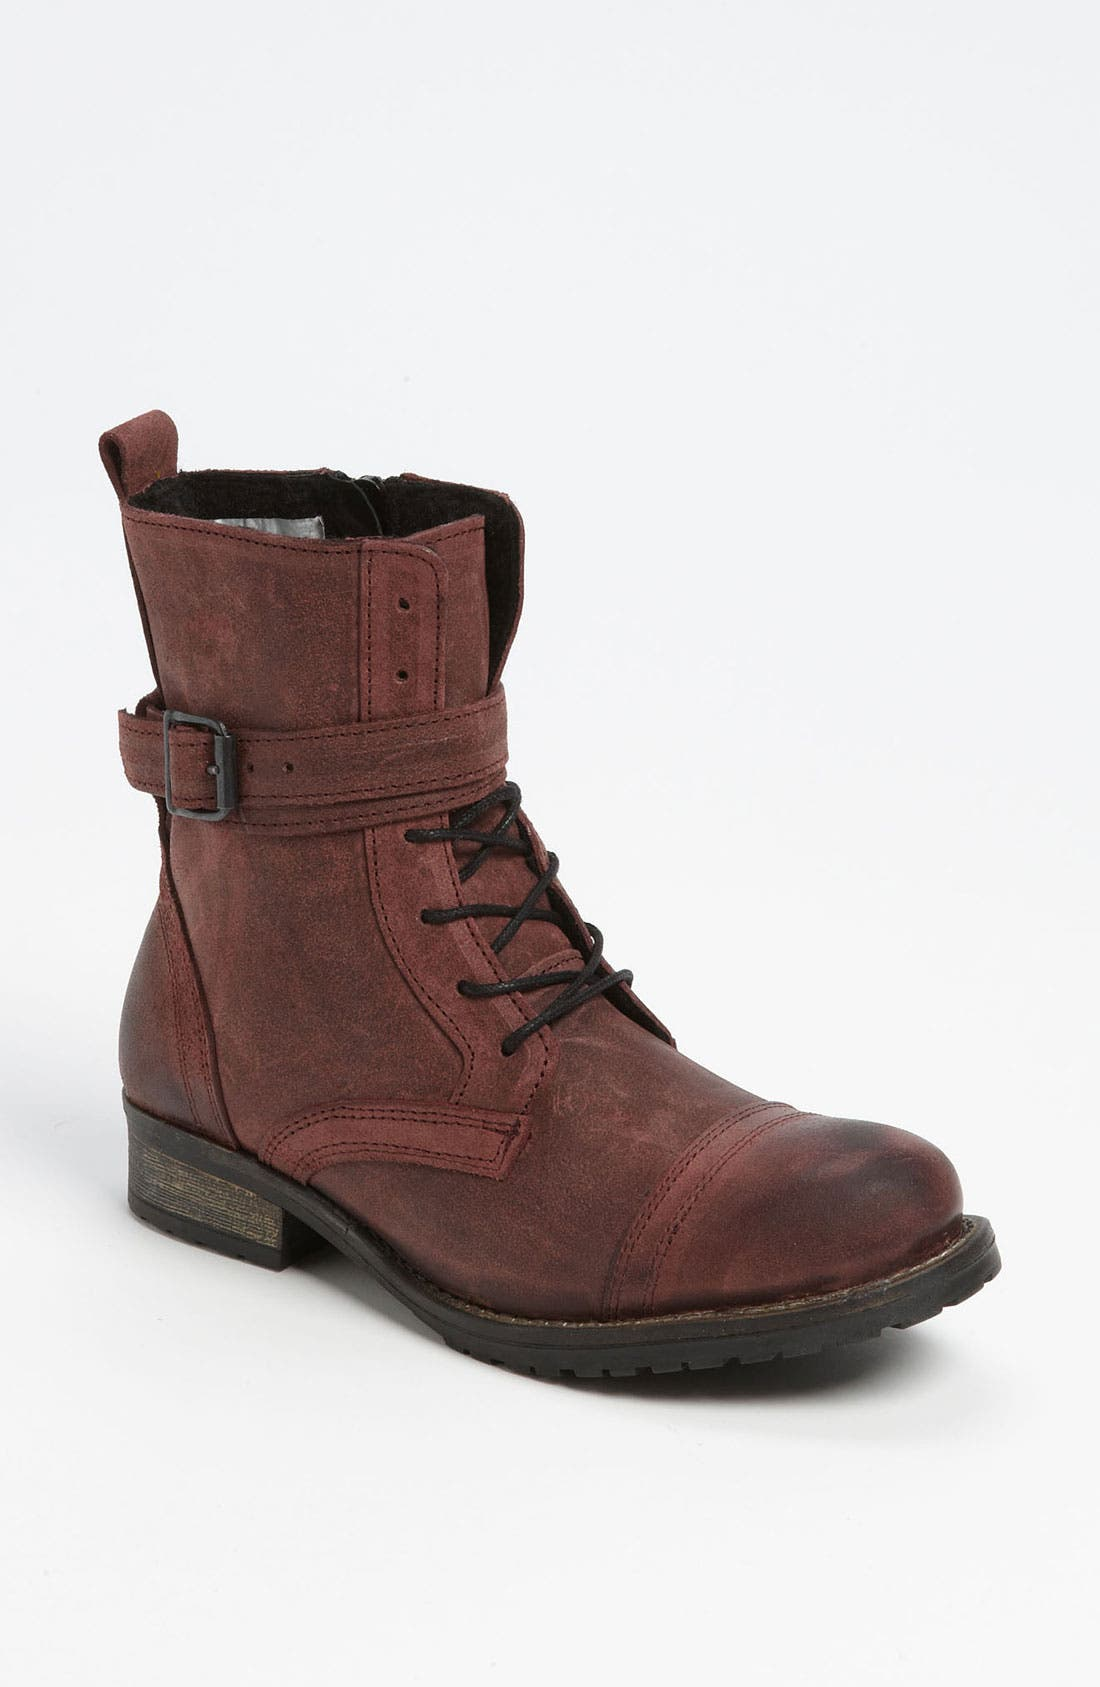 Main Image - Miz Mooz 'Bandit' Boot